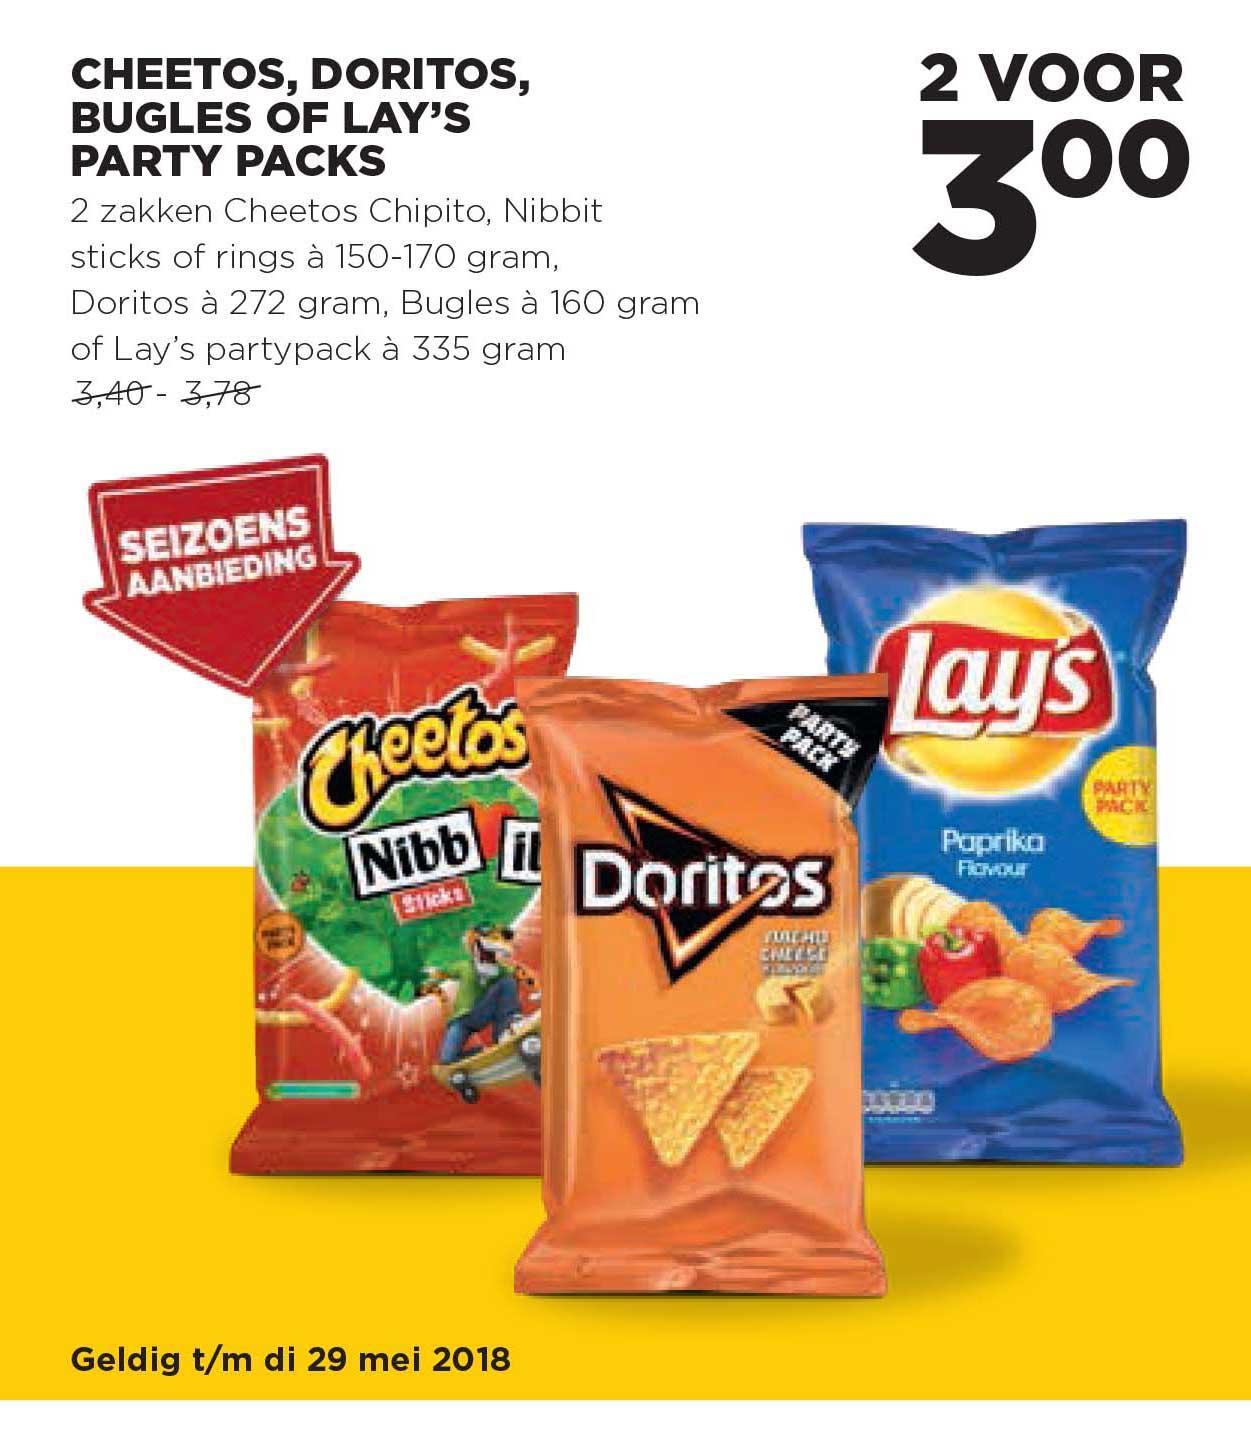 Jumbo Cheetos, Doritos, Bugles Of Lay's Party Packs